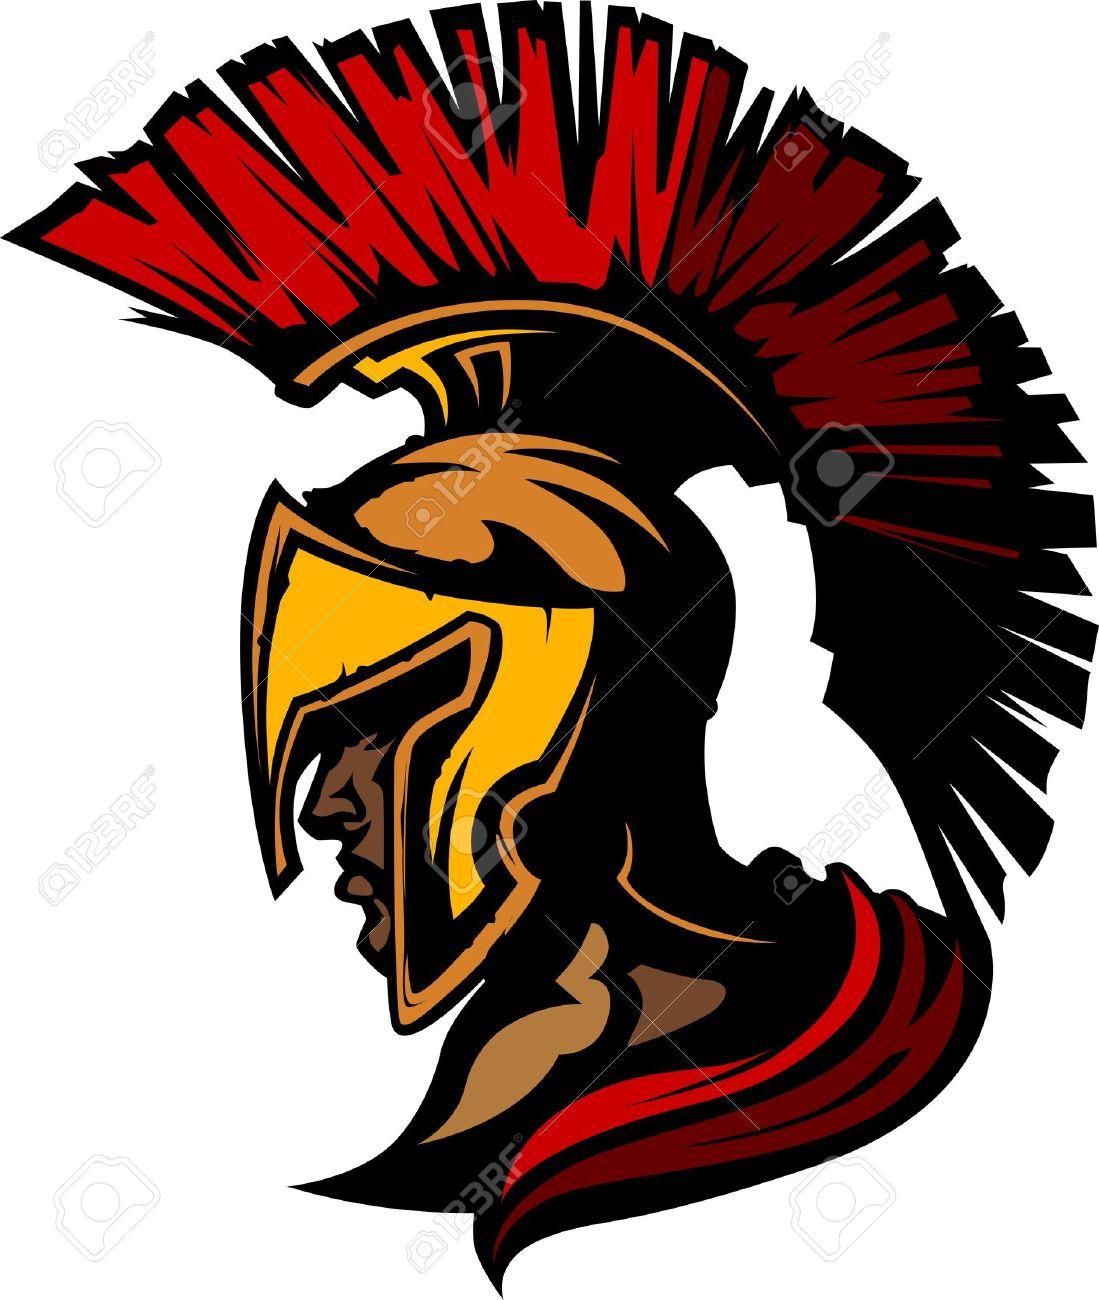 Roman Centurion Mascot Head with Helmet Stock Vector - 10457687